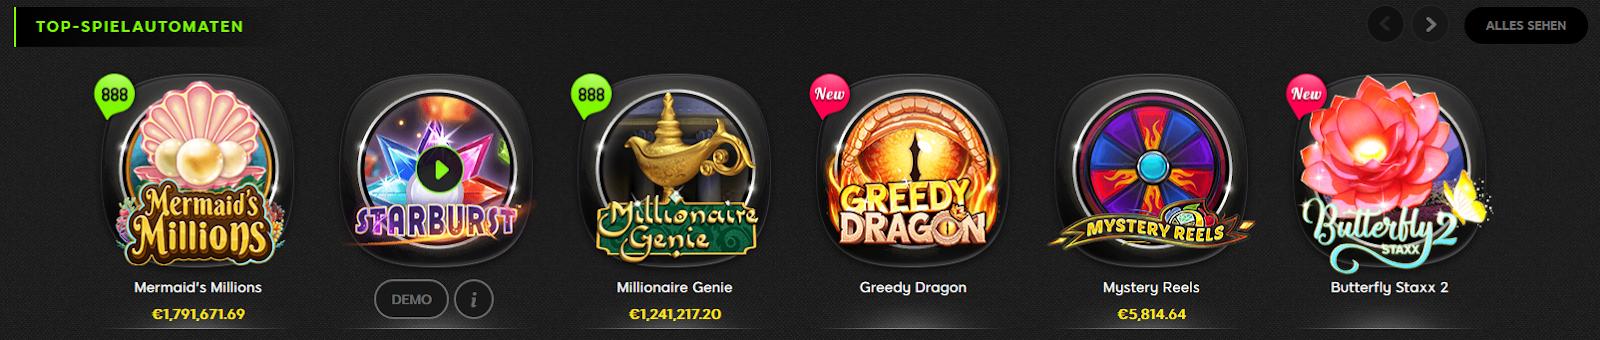 Jackpots auf 888 Casino